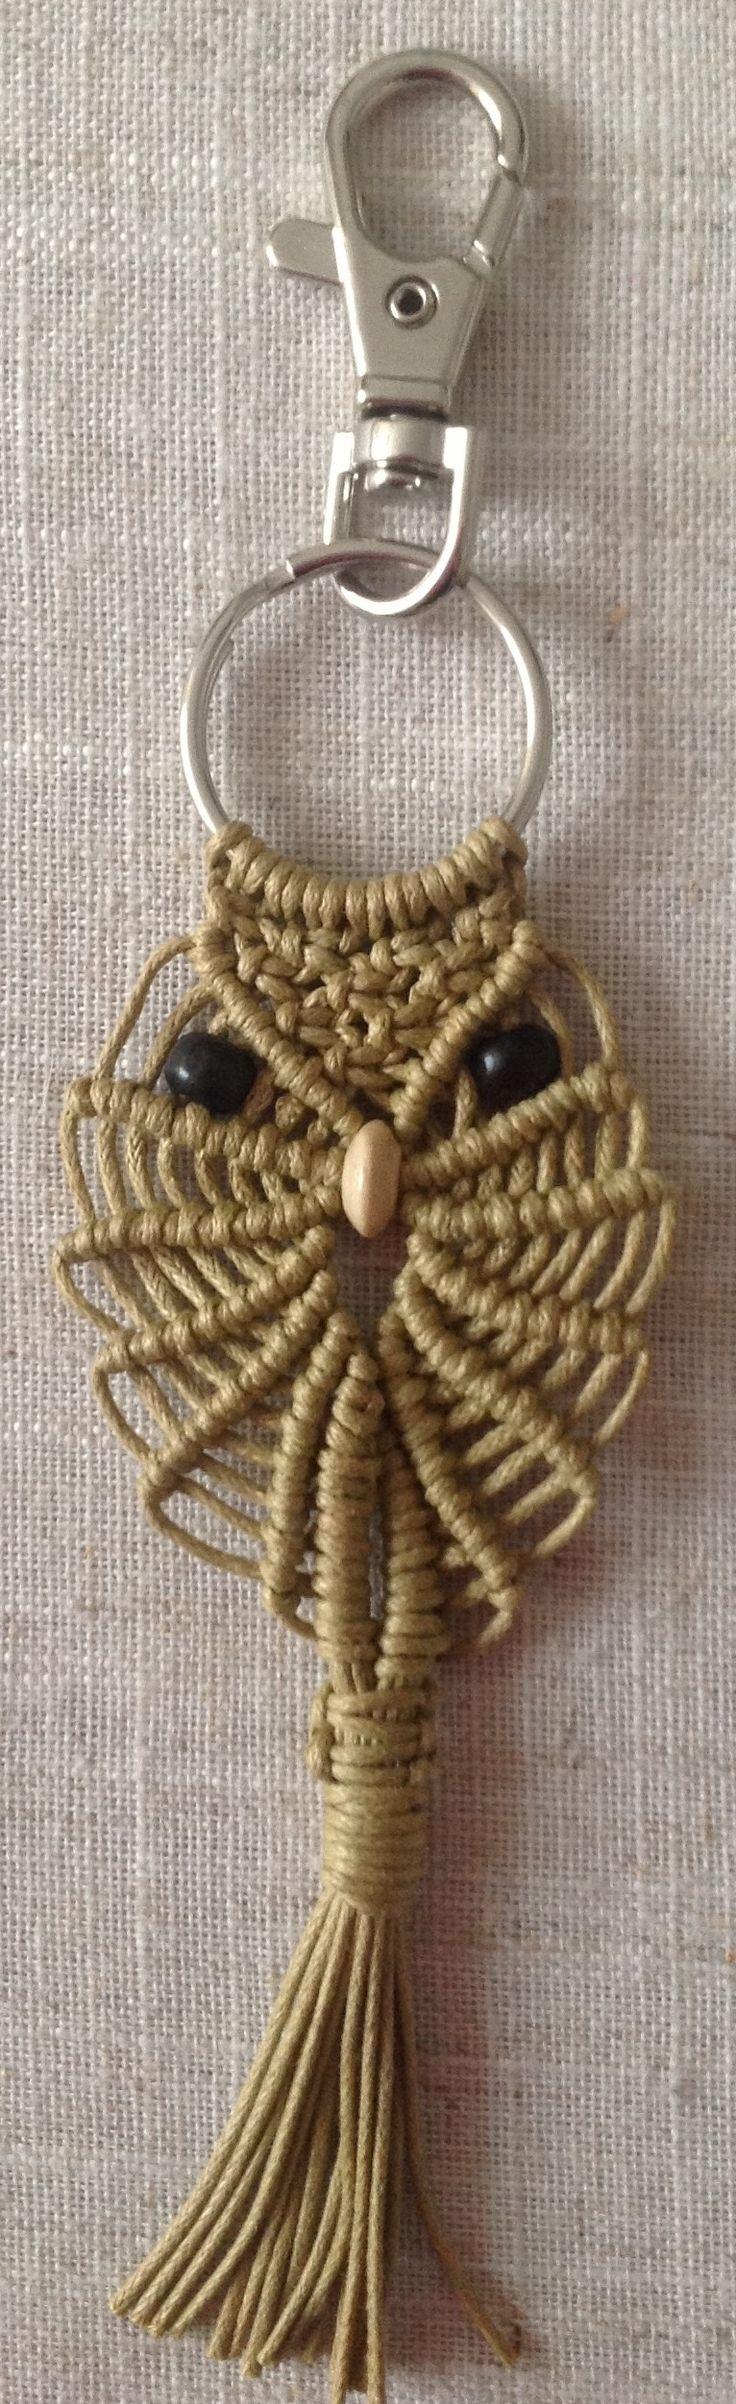 Handmade Macramé Owl Keyring / Bag Charm